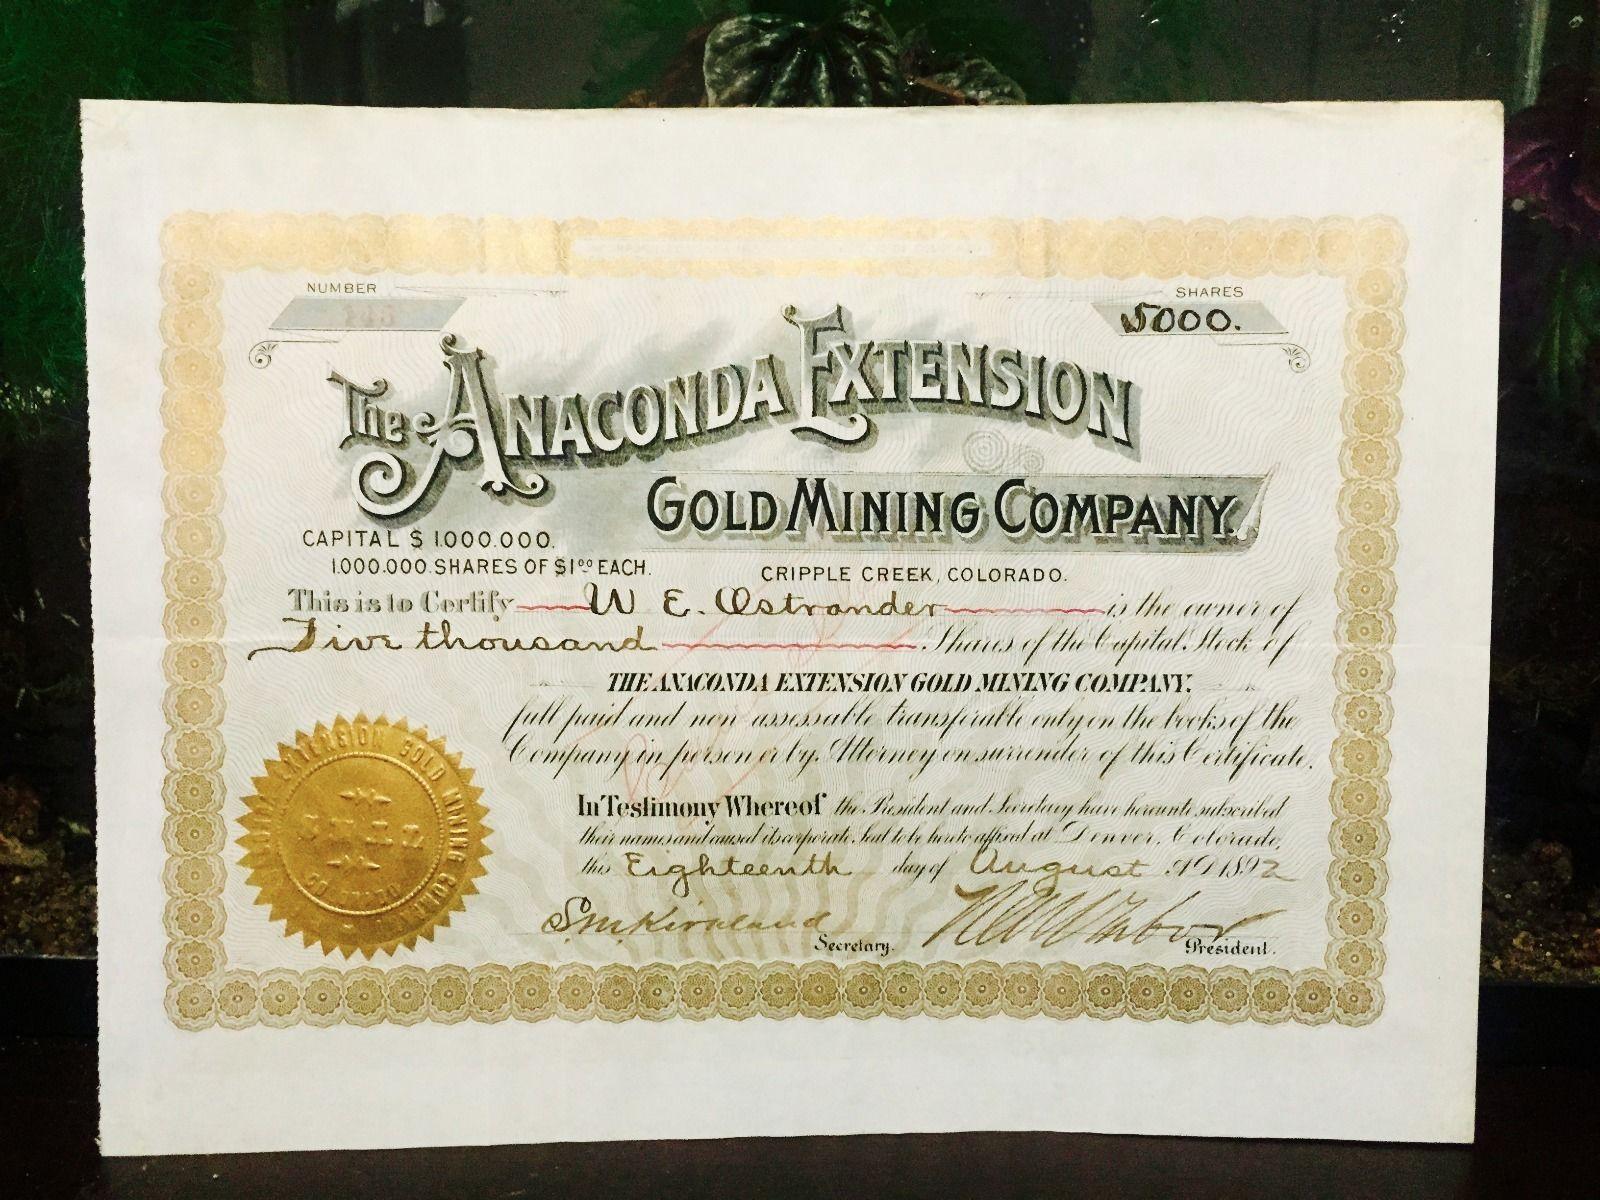 Anaconda Extension Gold Mining Company Stock of Cripple Creek